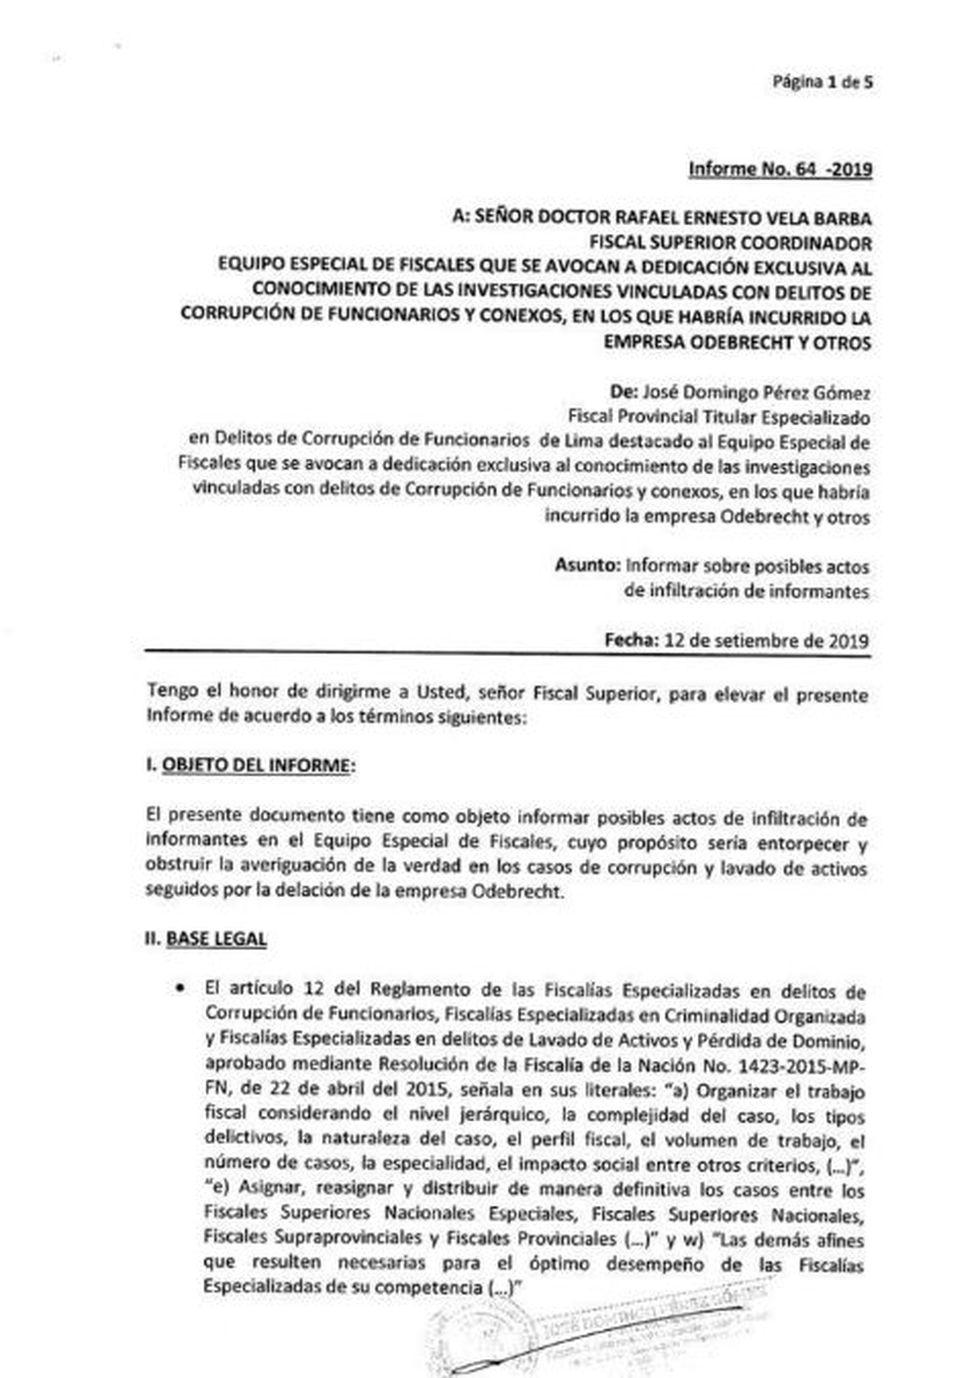 Documento que Pérez envió a Rafael Vela